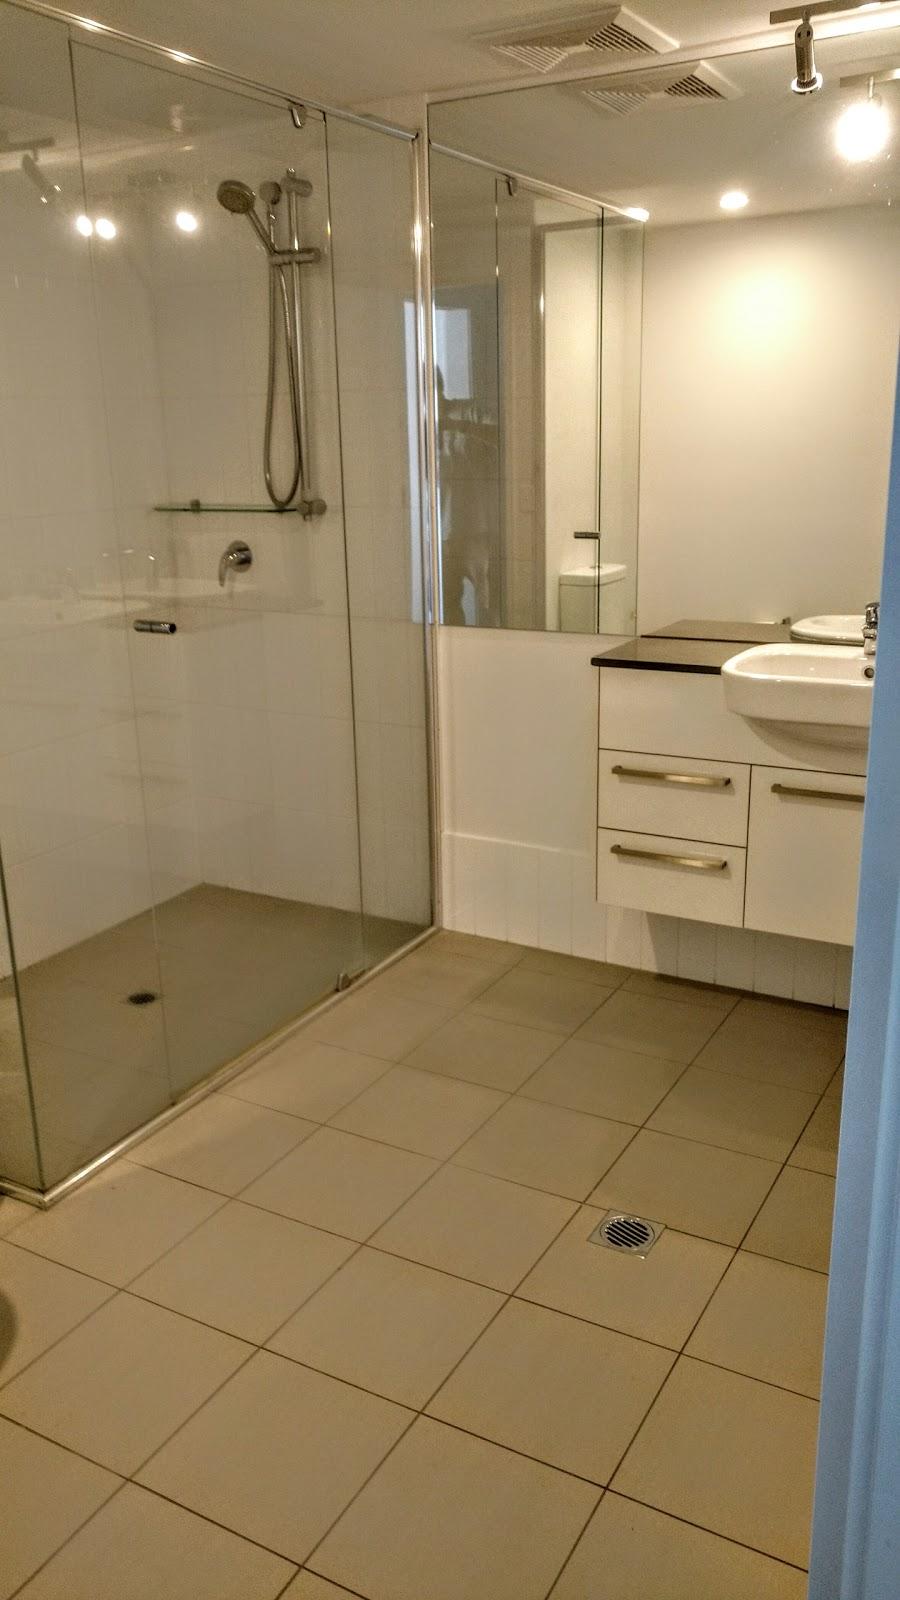 Q Resorts Paddington | lodging | 5 Kingsway Pl, Townsville City QLD 4810, Australia | 0747213001 OR +61 7 4721 3001